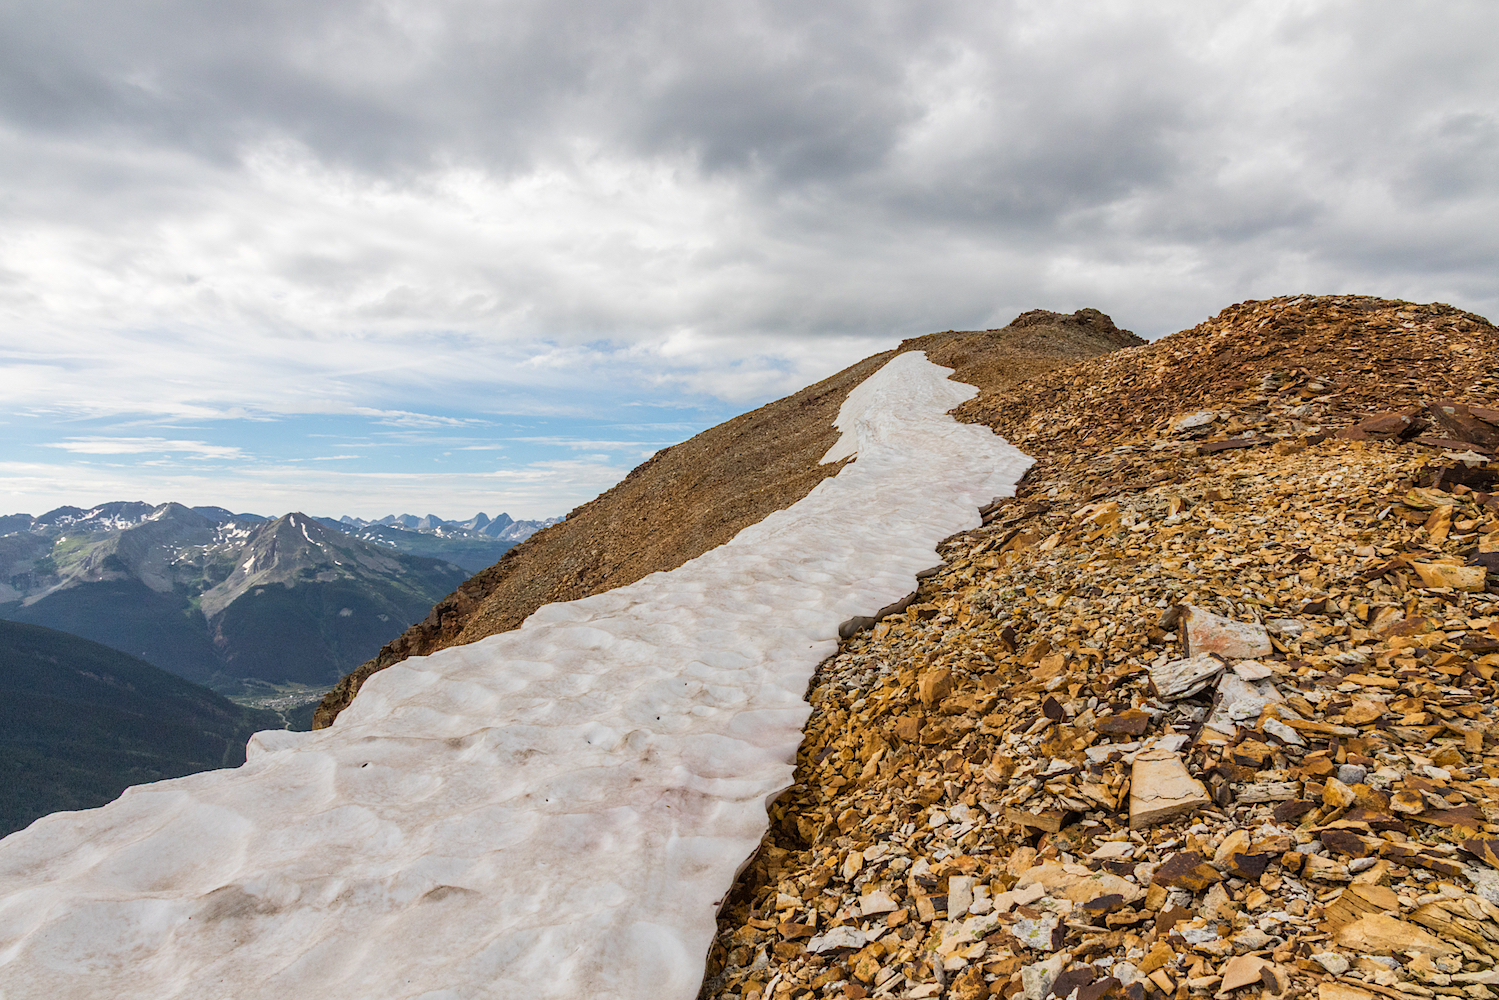 Snow remaining on ridge